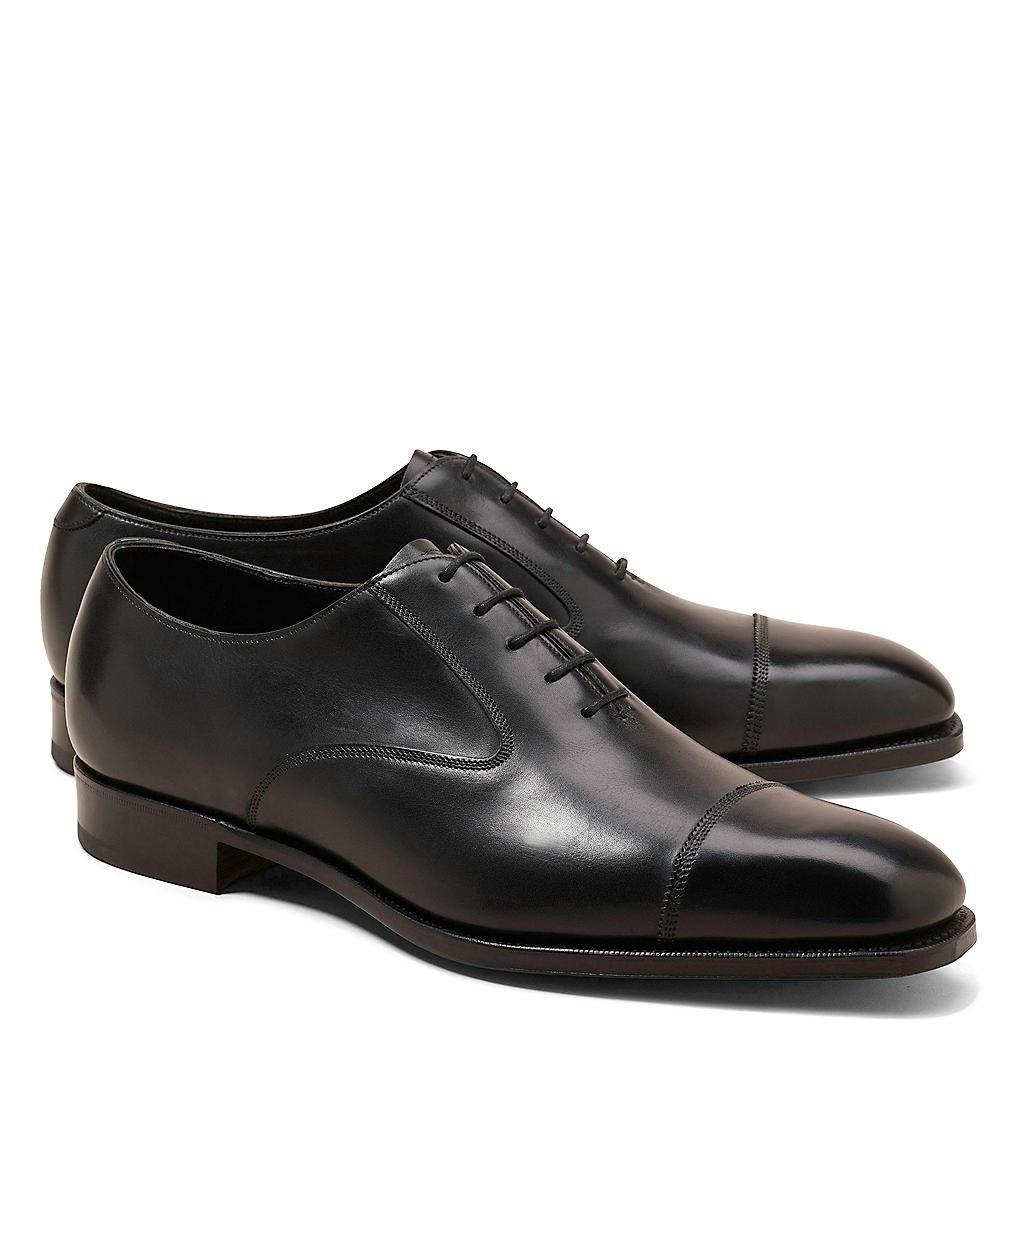 Edward Green black captoe oxford shoes